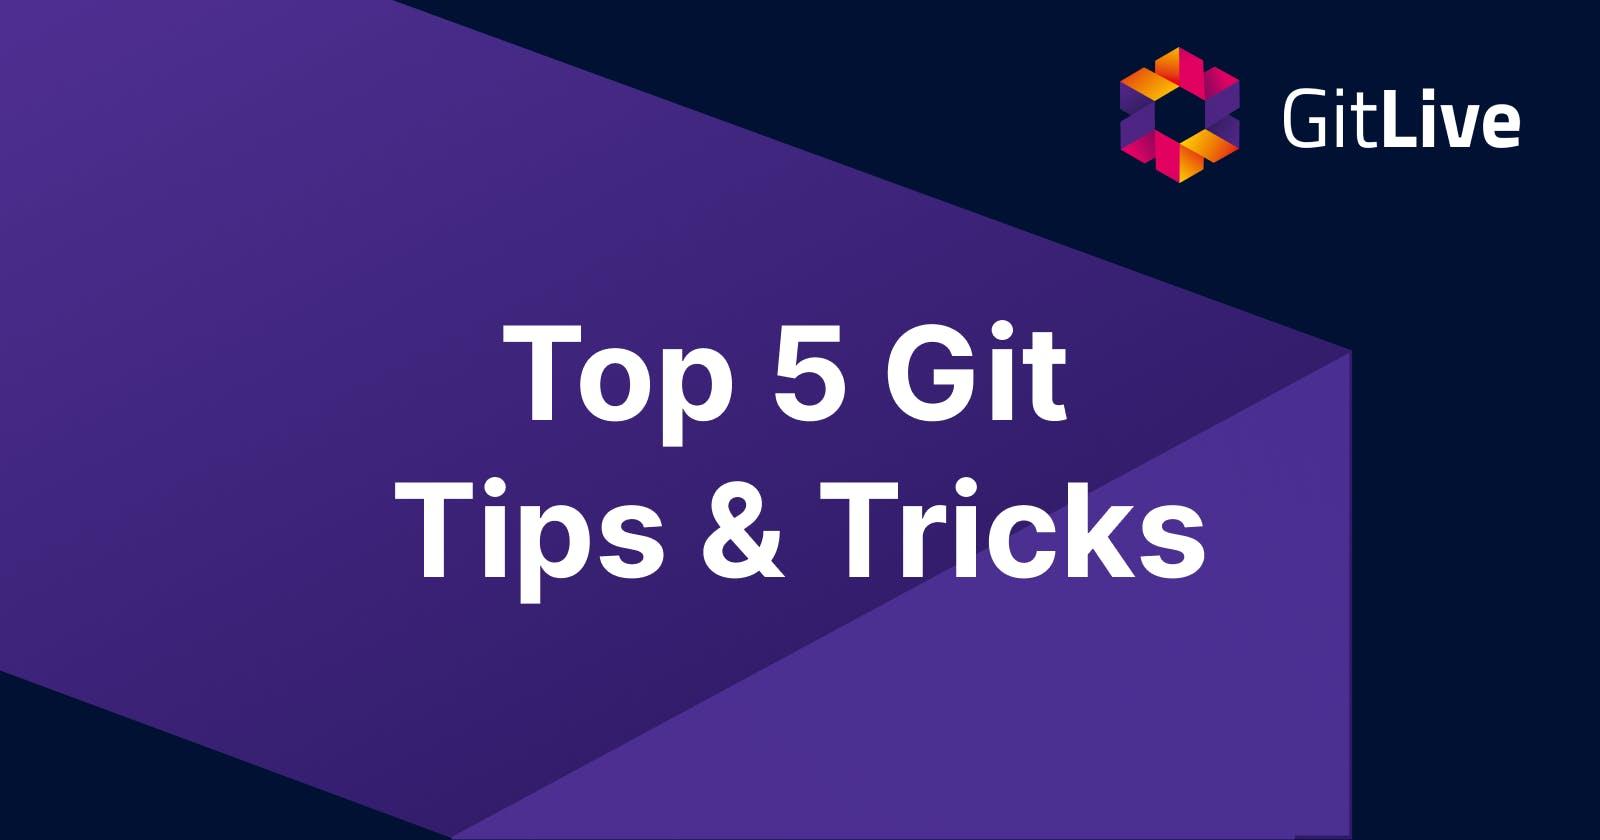 Top 5 Git Tips & Tricks